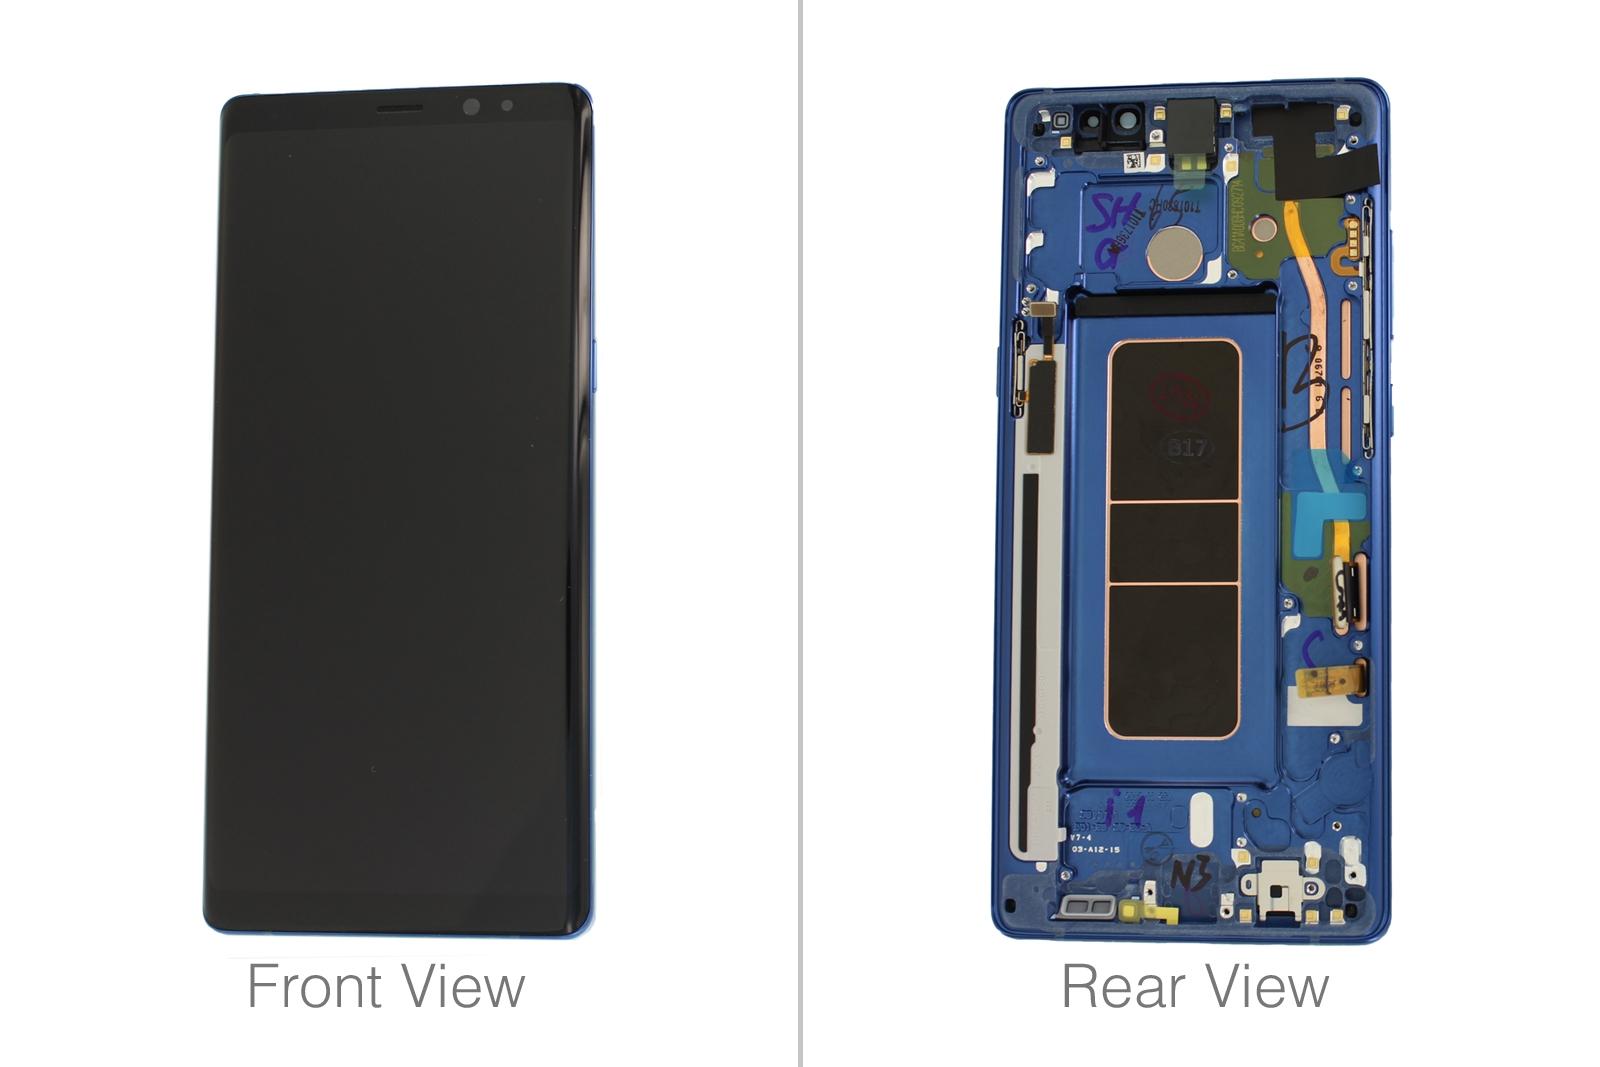 Genuine Note - Gh97-21065b N950 8 Lcd Galaxy Samsung About Digitizer amp; Blue Screen Details